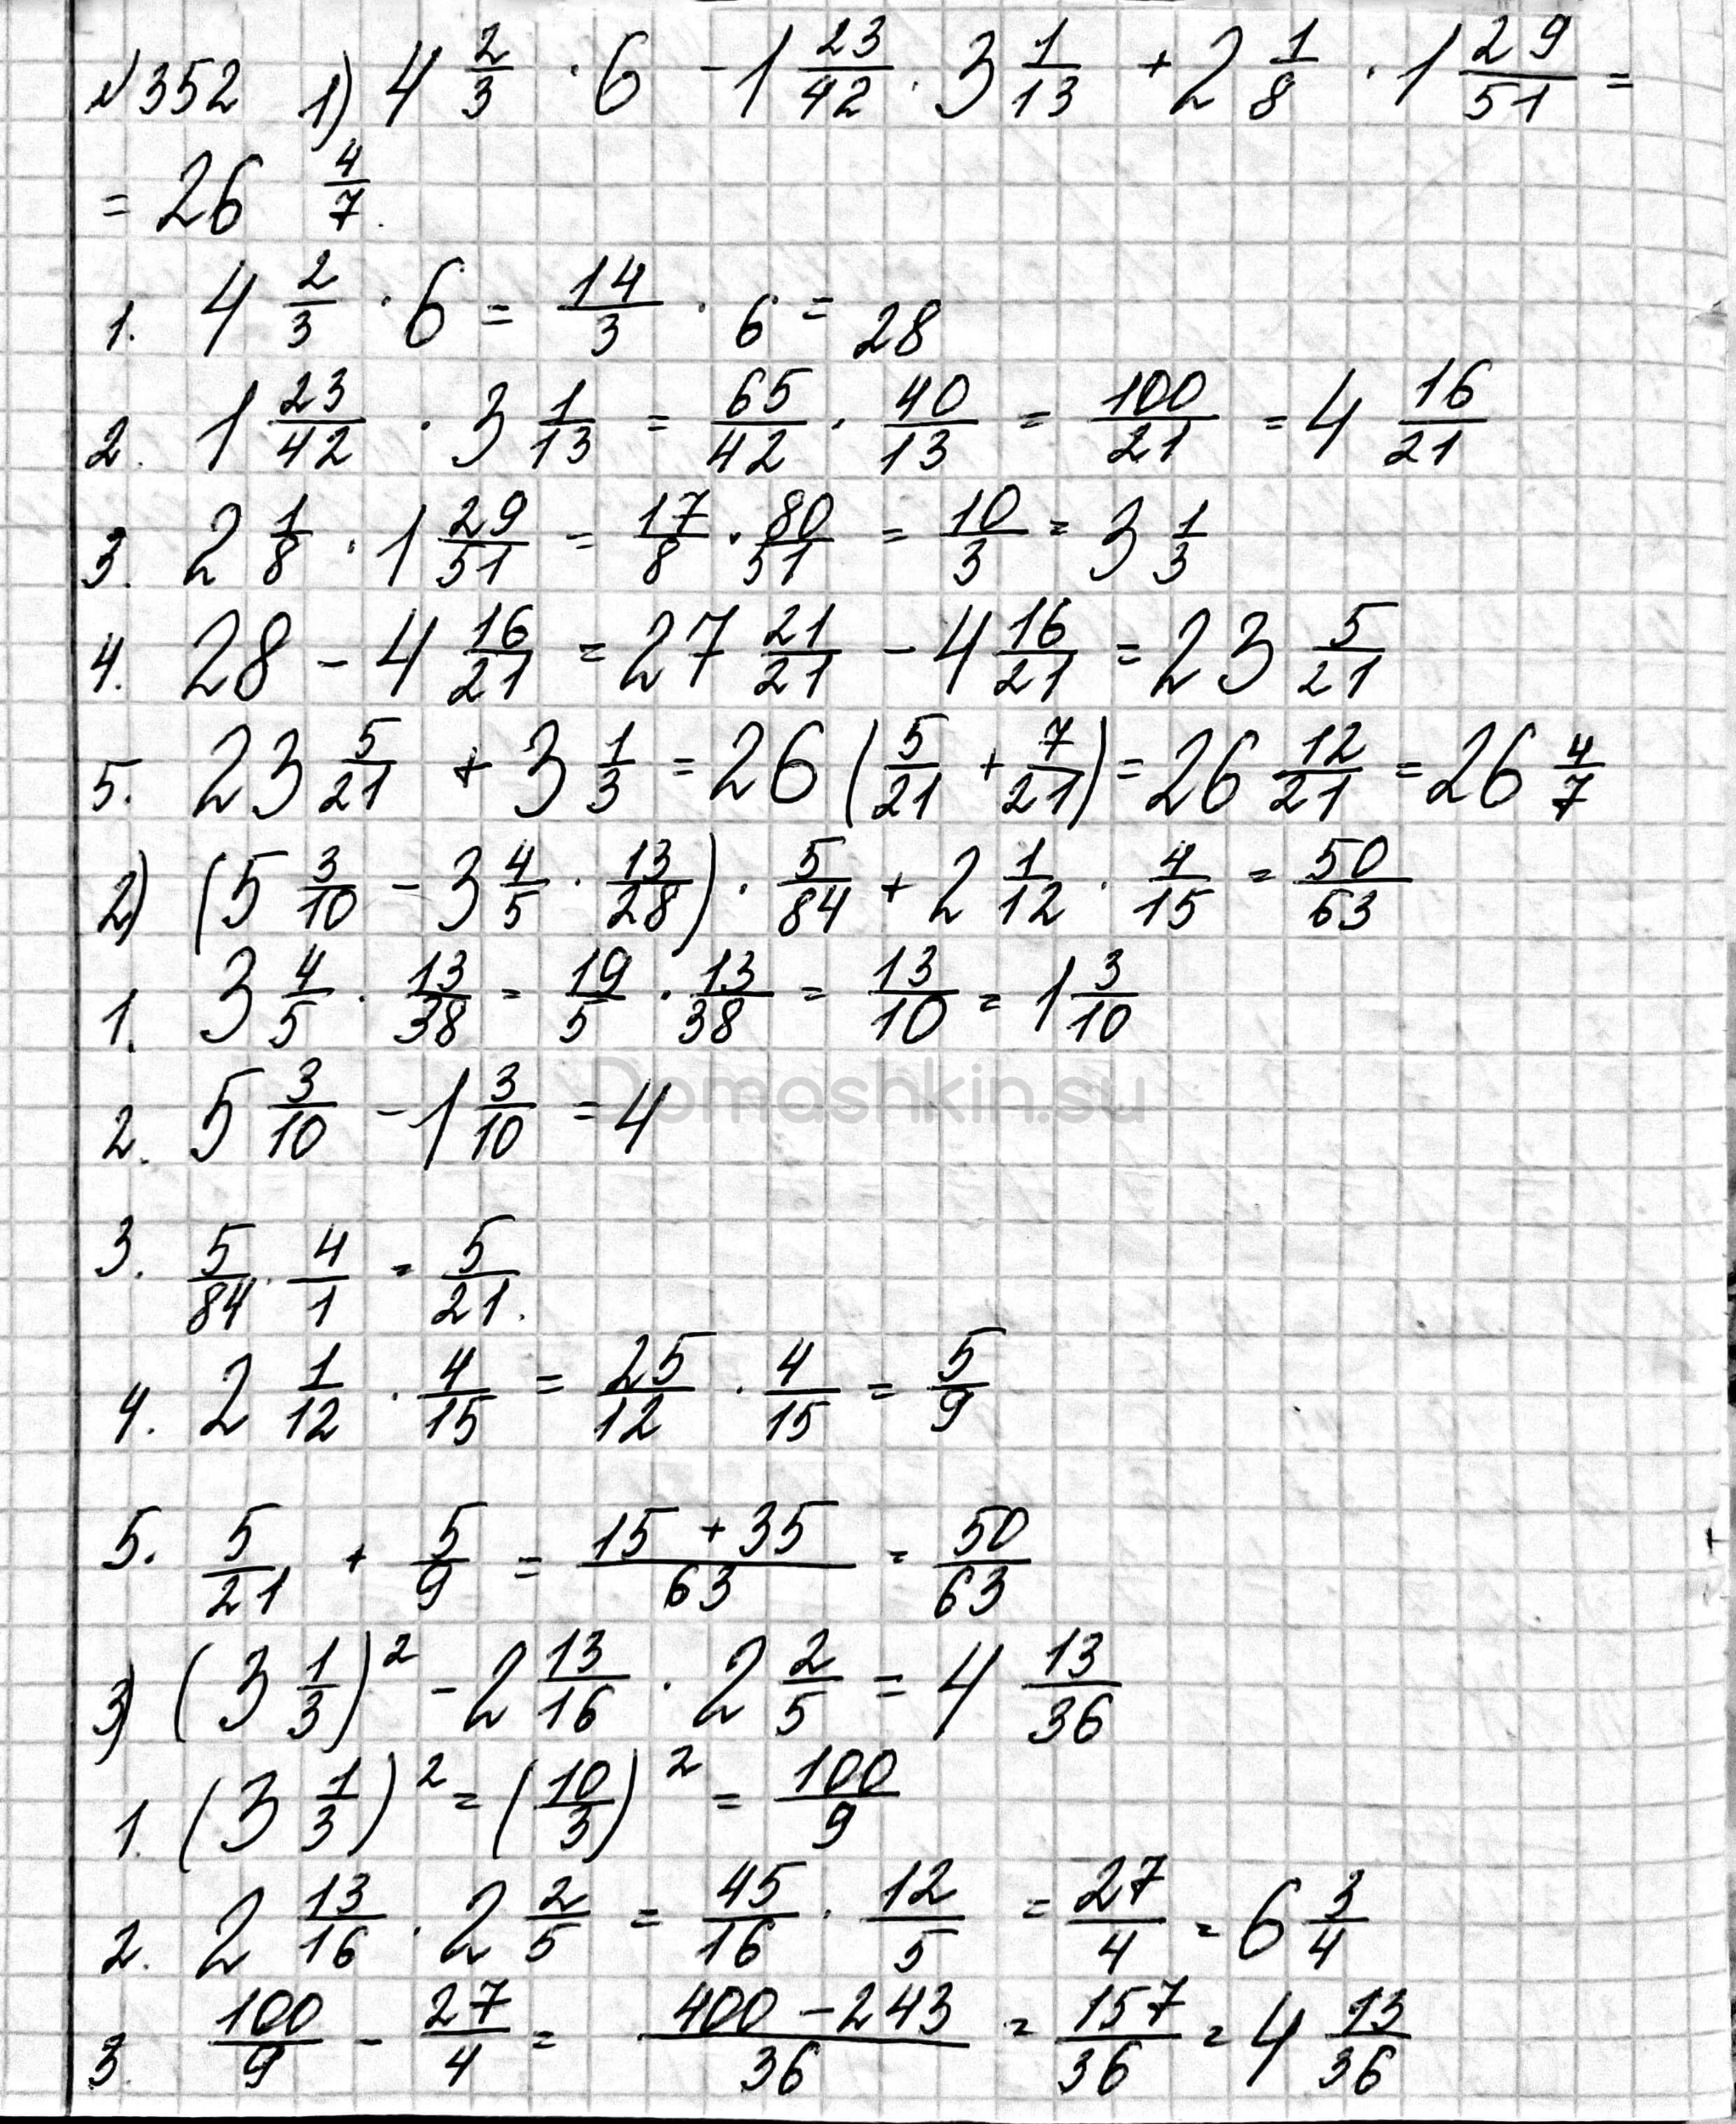 Математика 6 класс учебник Мерзляк номер 352 решение